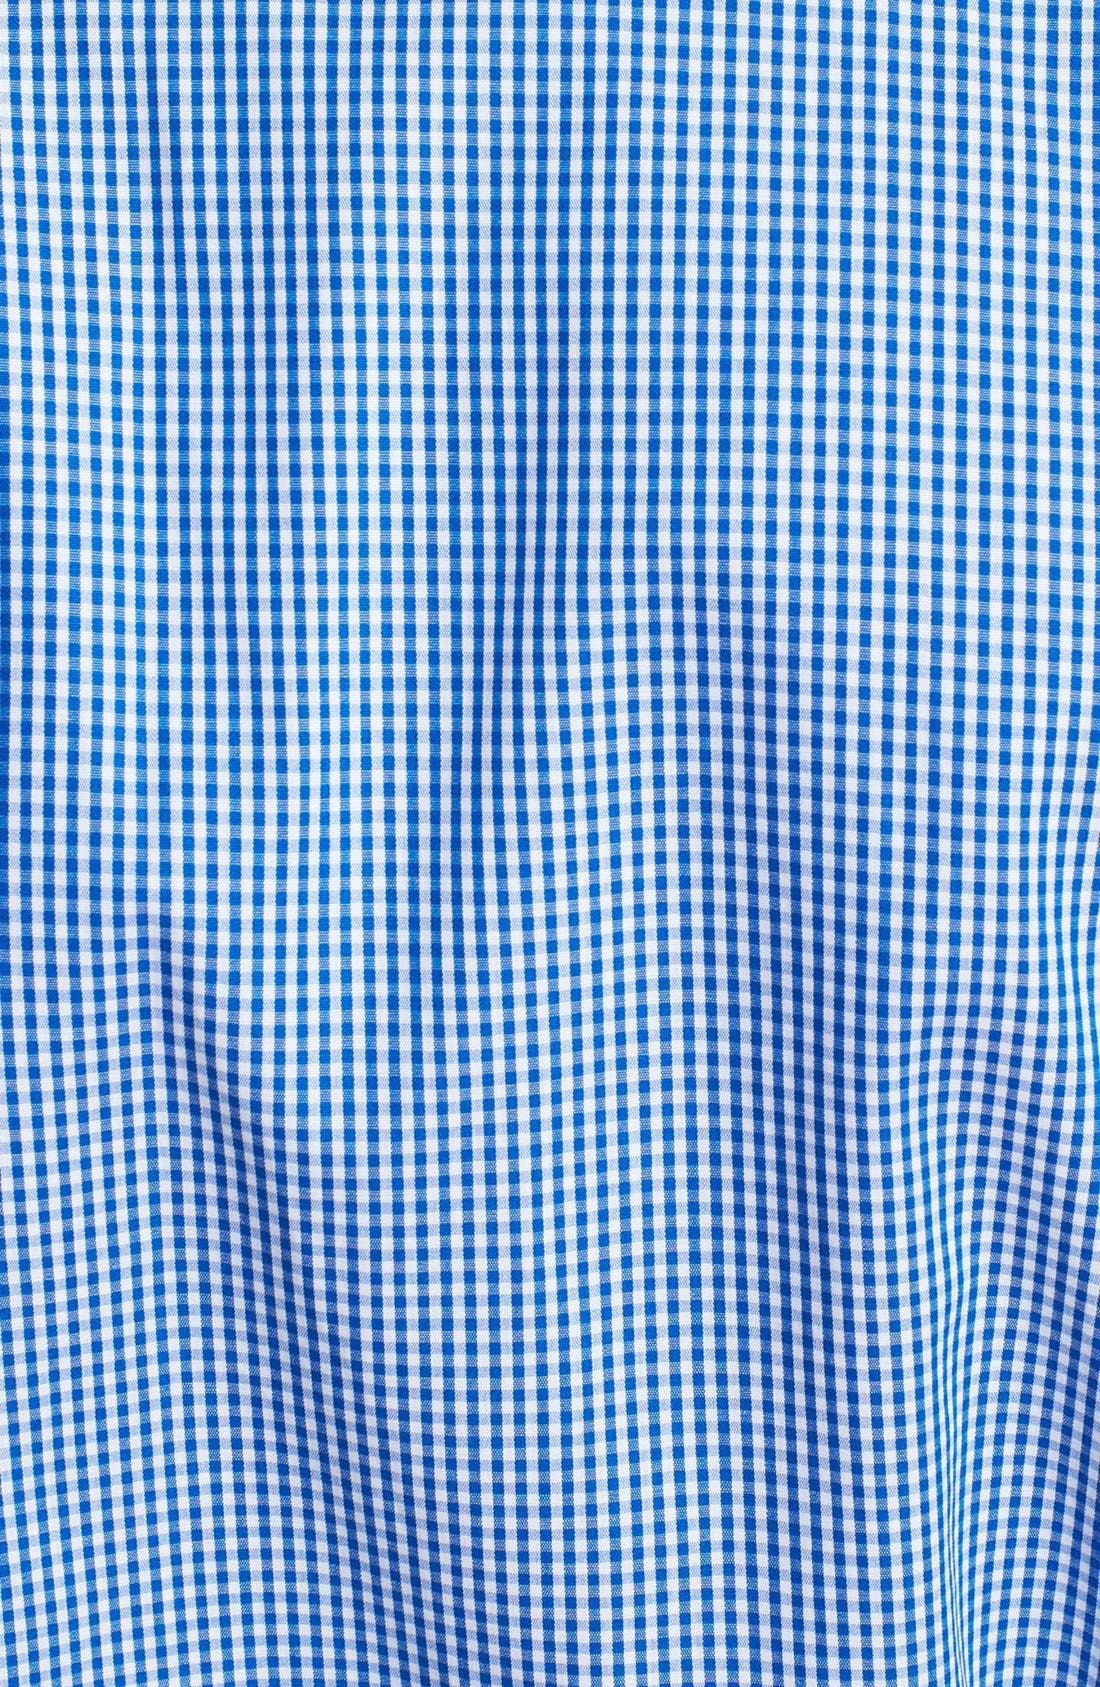 Alternate Image 3  - Paul Smith London Check Cotton Shirt